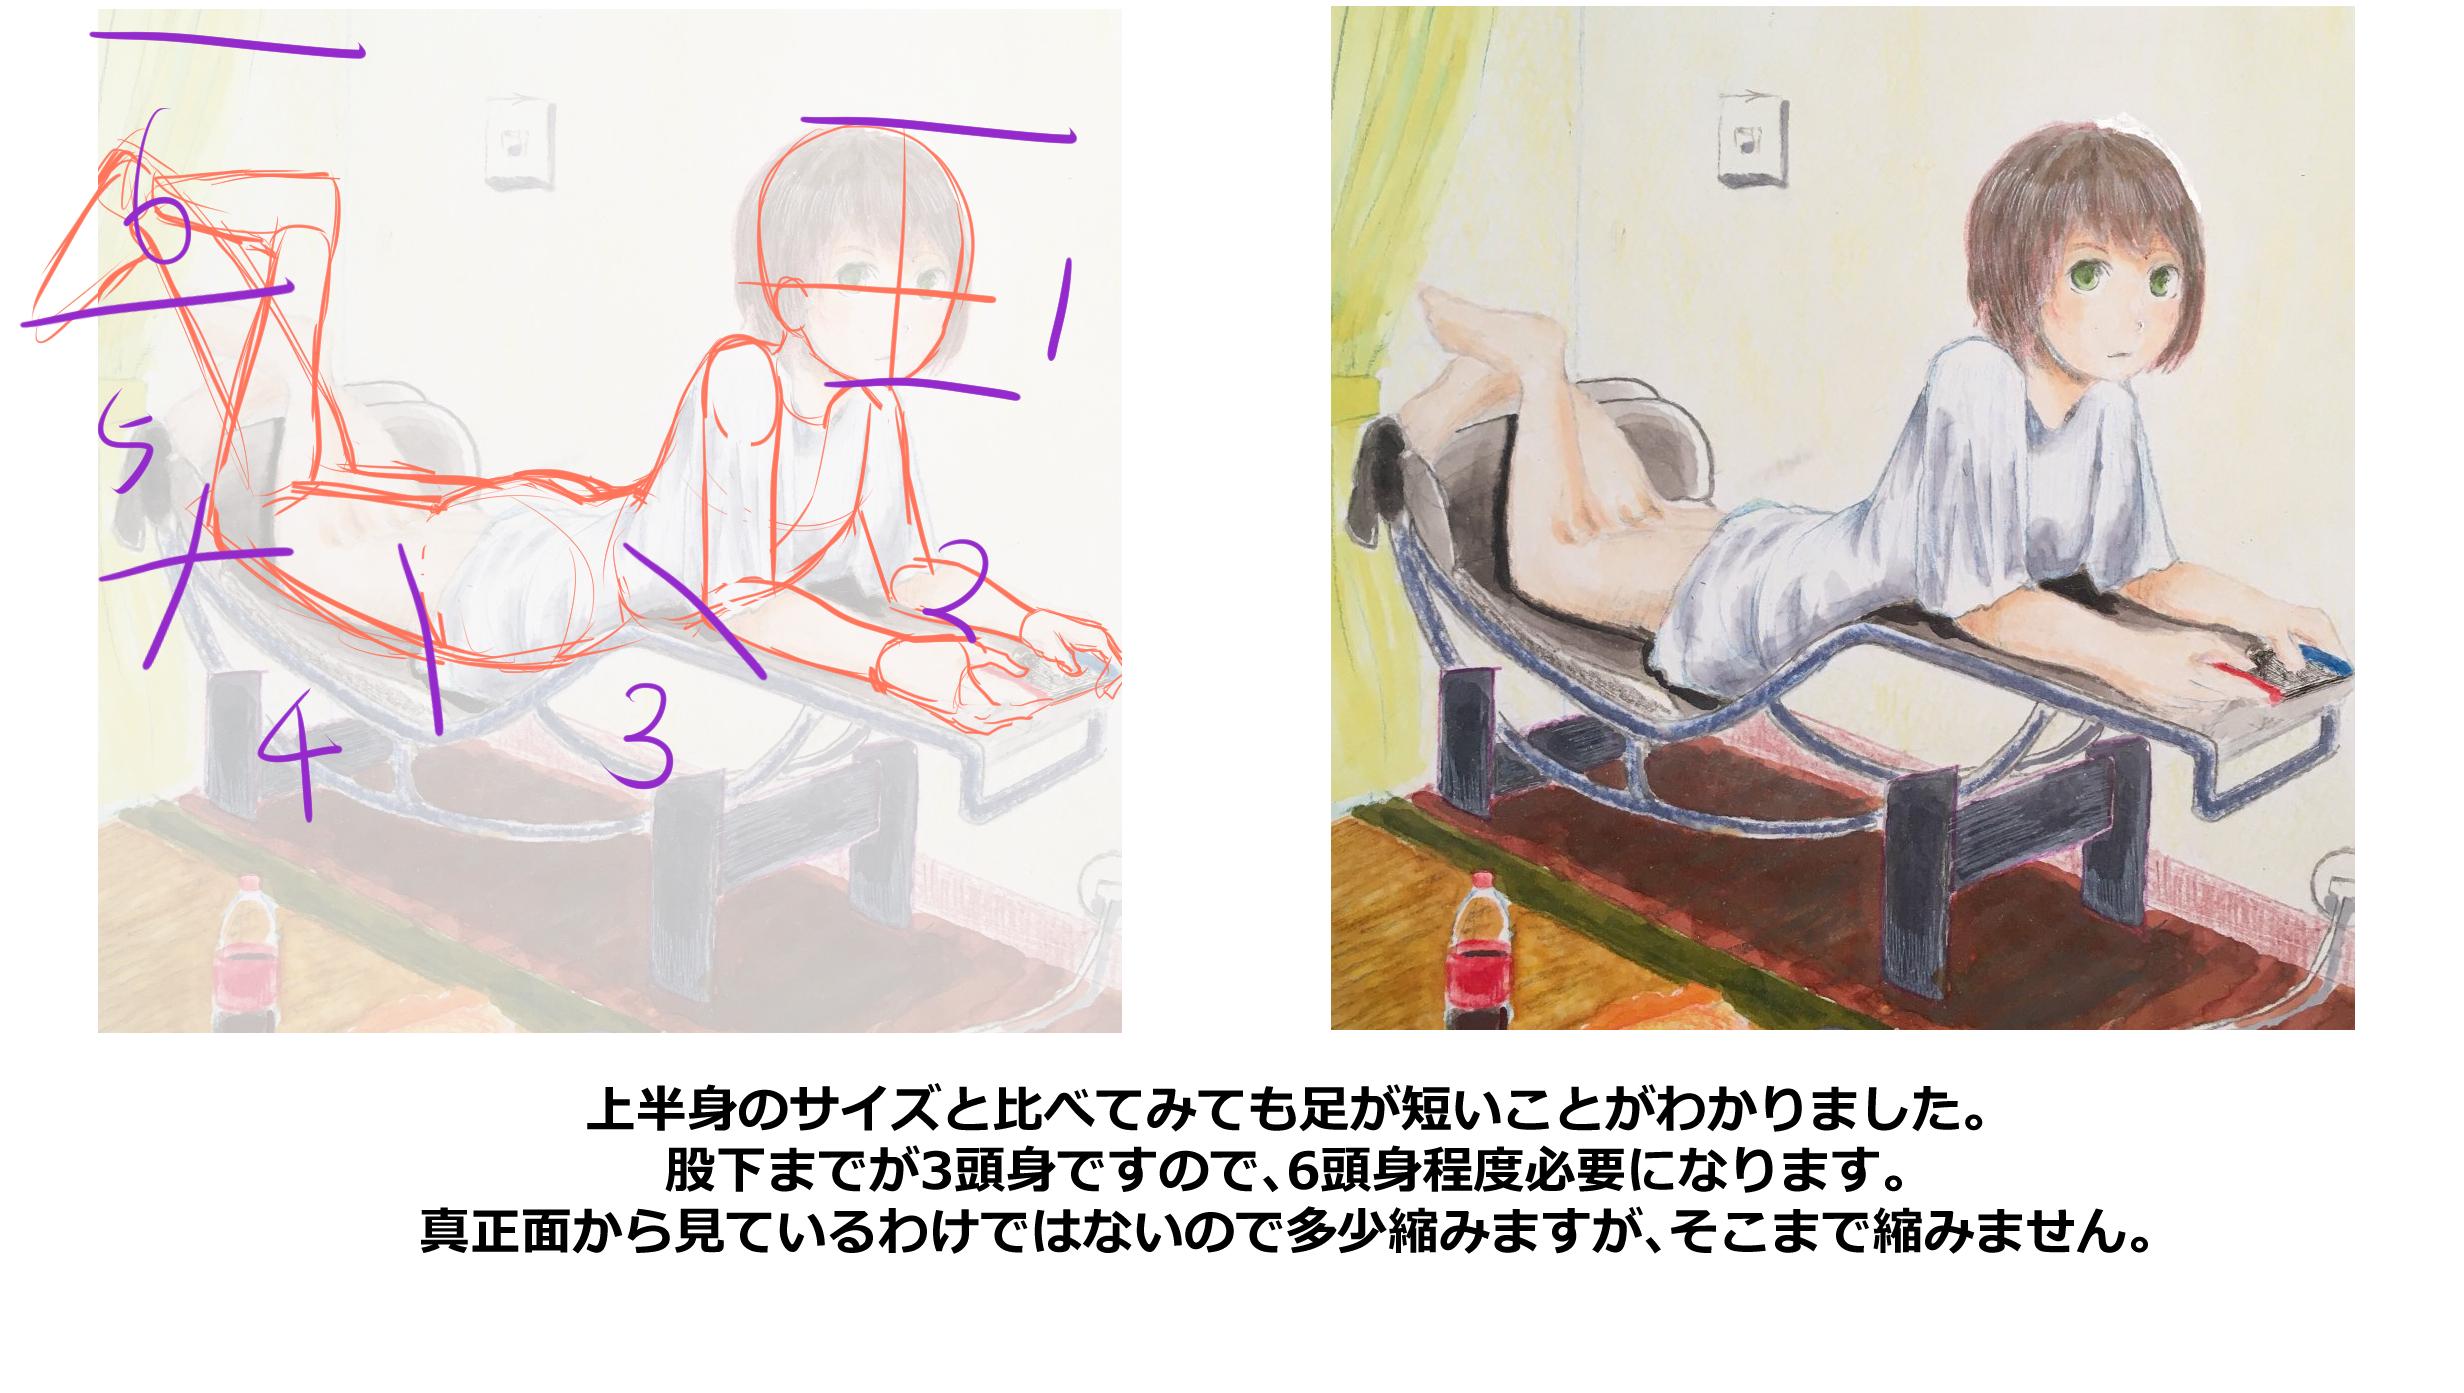 sahbxO2l_04.jpg